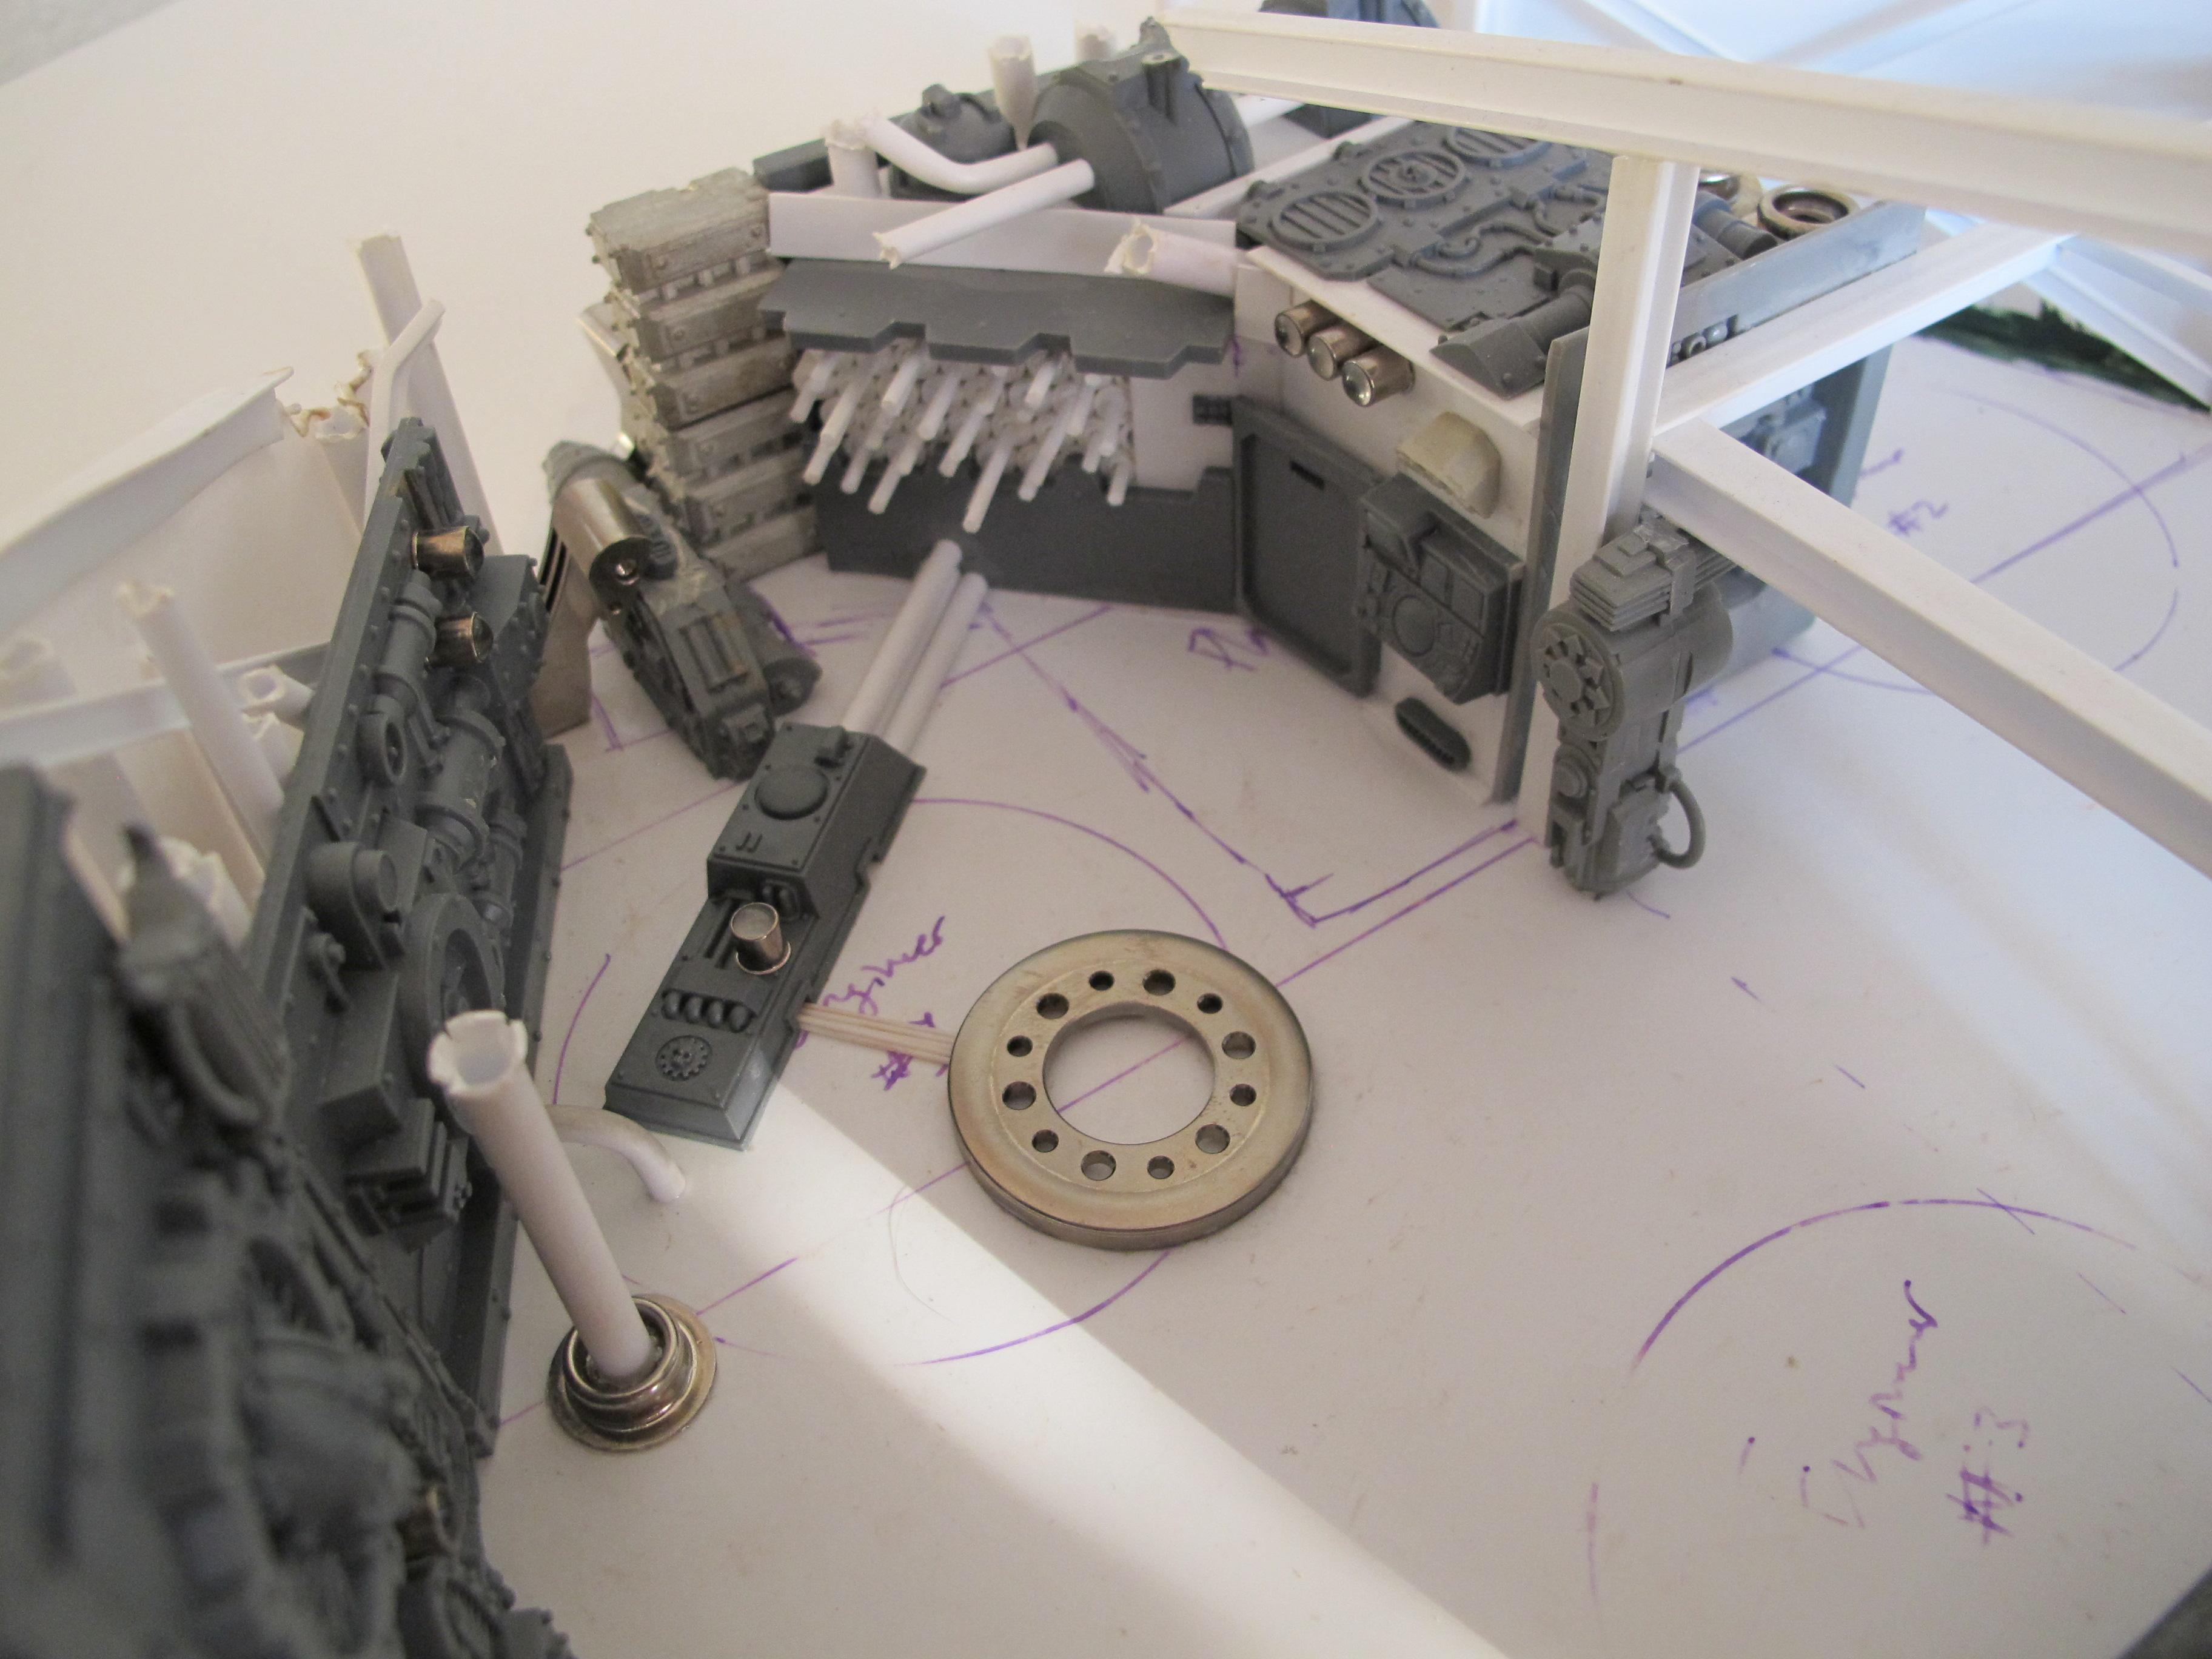 Chaos Space Marines, Crashed Spaceship, Death Guard, Greenstuff, Plasticard, Ship, Work In Progress